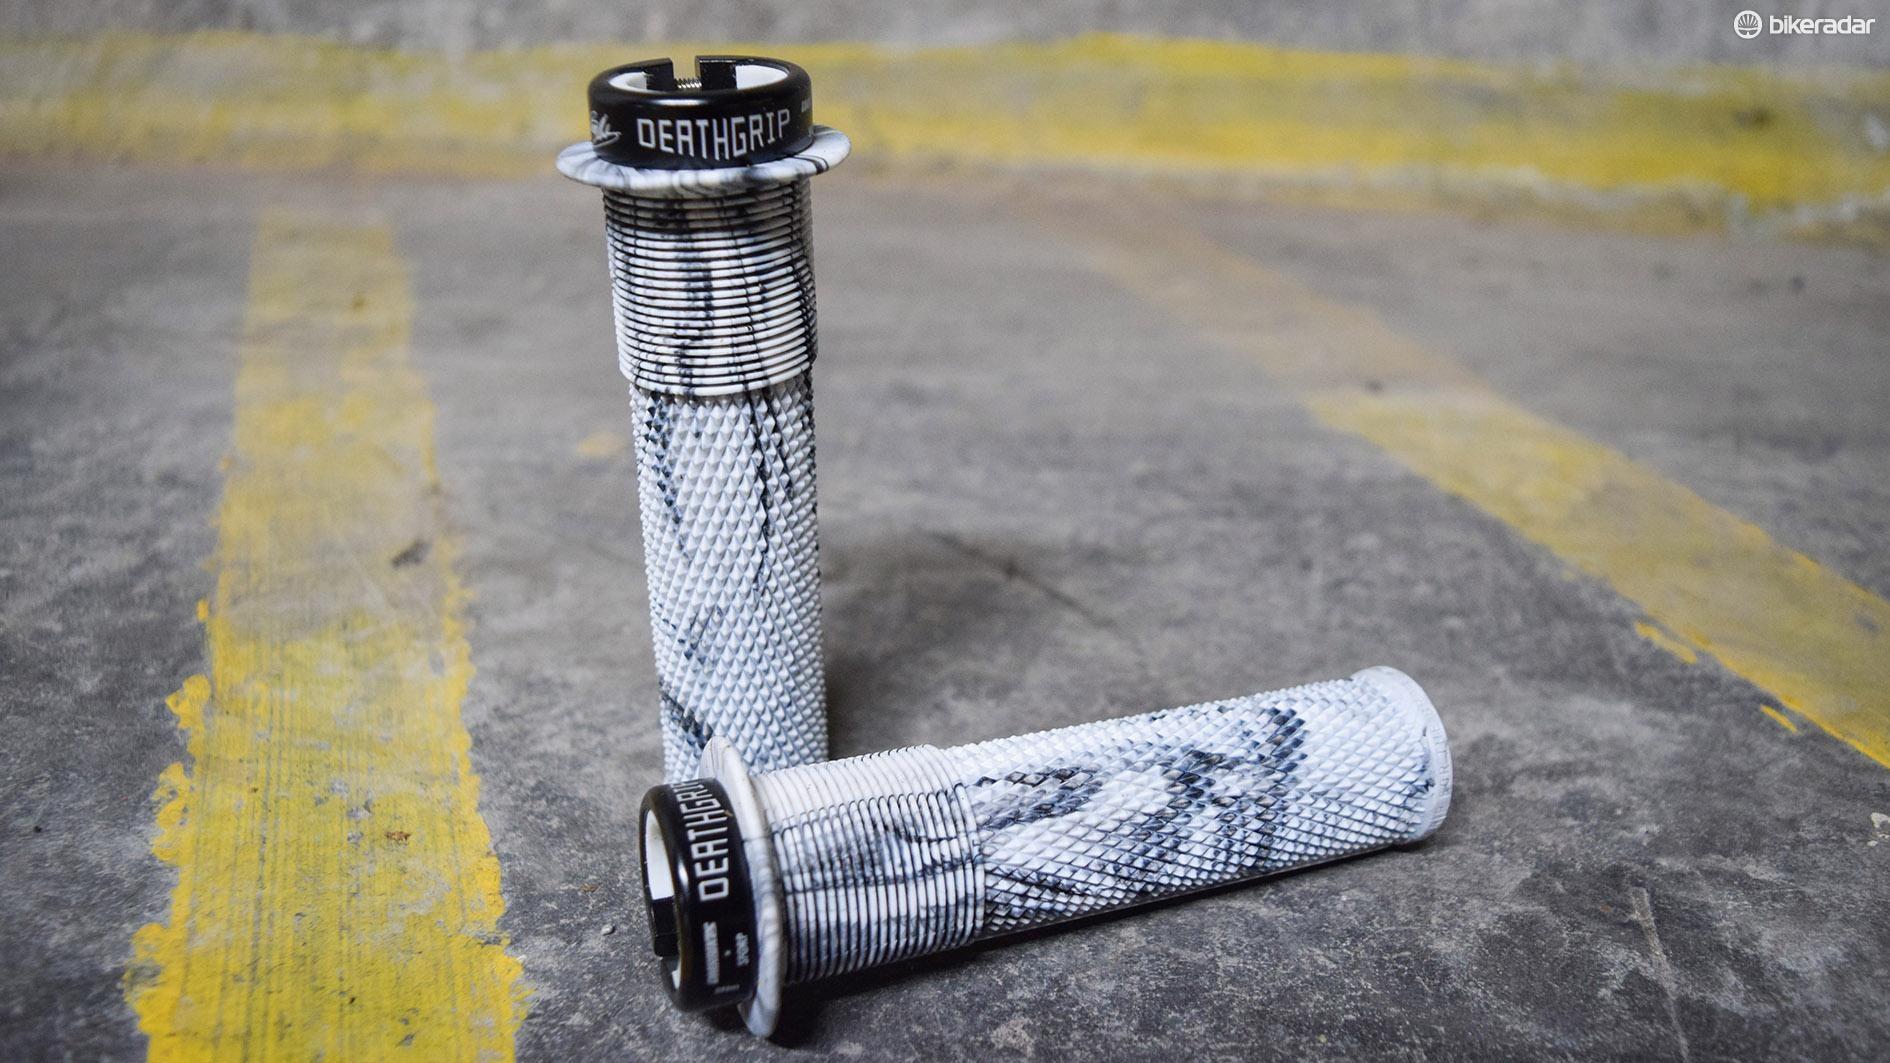 Brendog approved grips by DMR